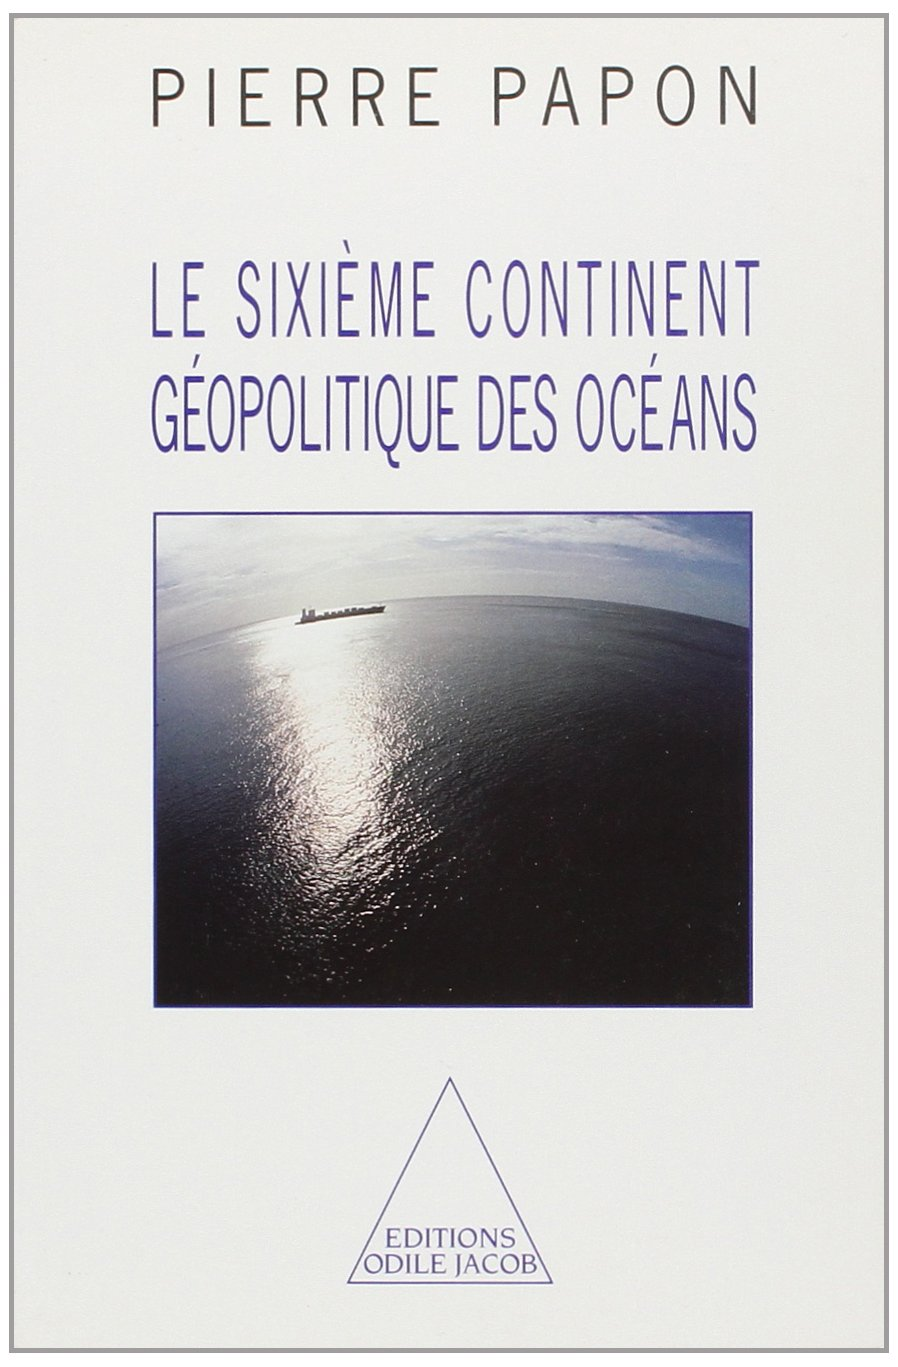 Les Prodigieuses Victoires De La Psychologie Moderne Ebook Download